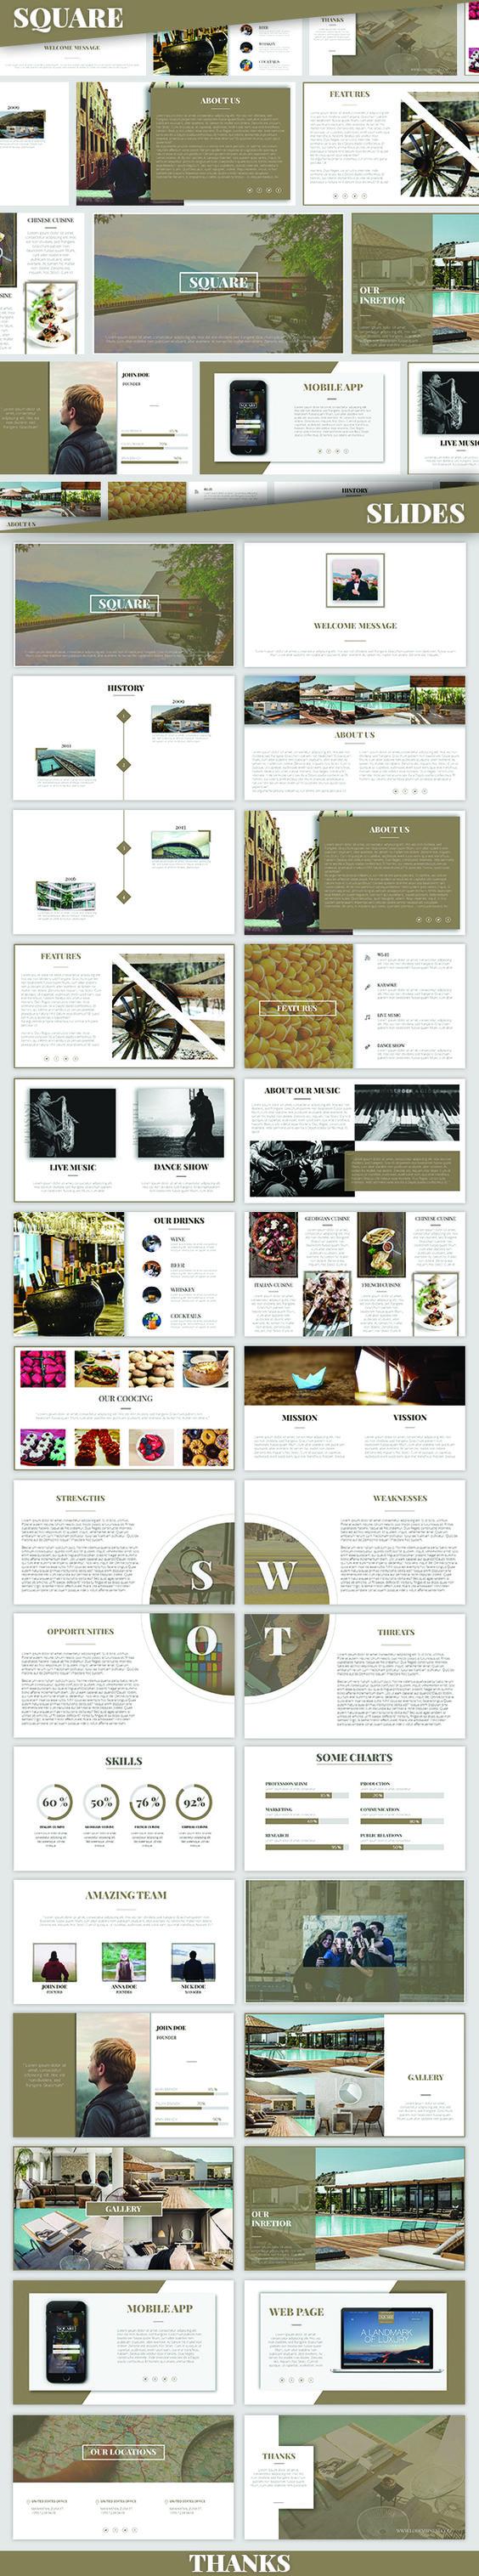 square - powerpoint presentation | creative powerpoint, powerpoint, Modern powerpoint